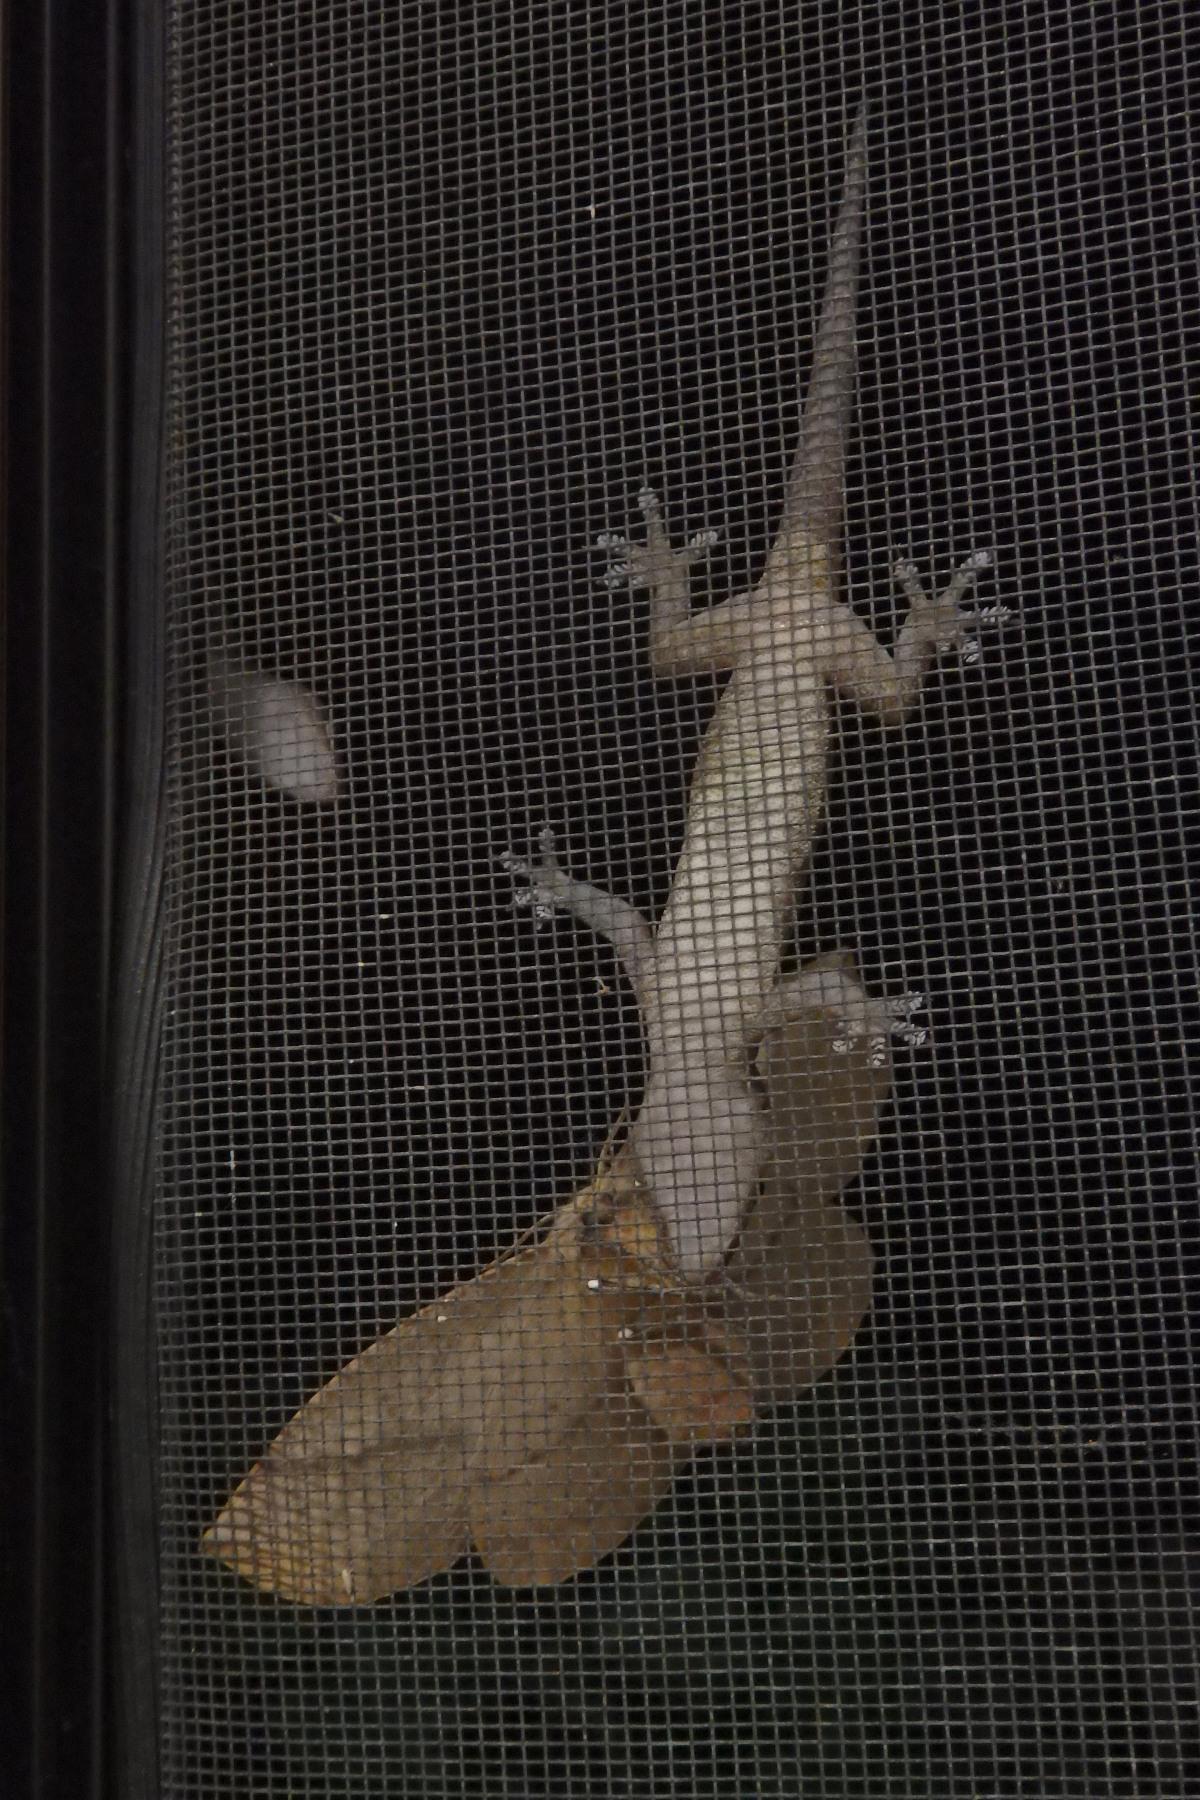 asian house gecko eating a moth